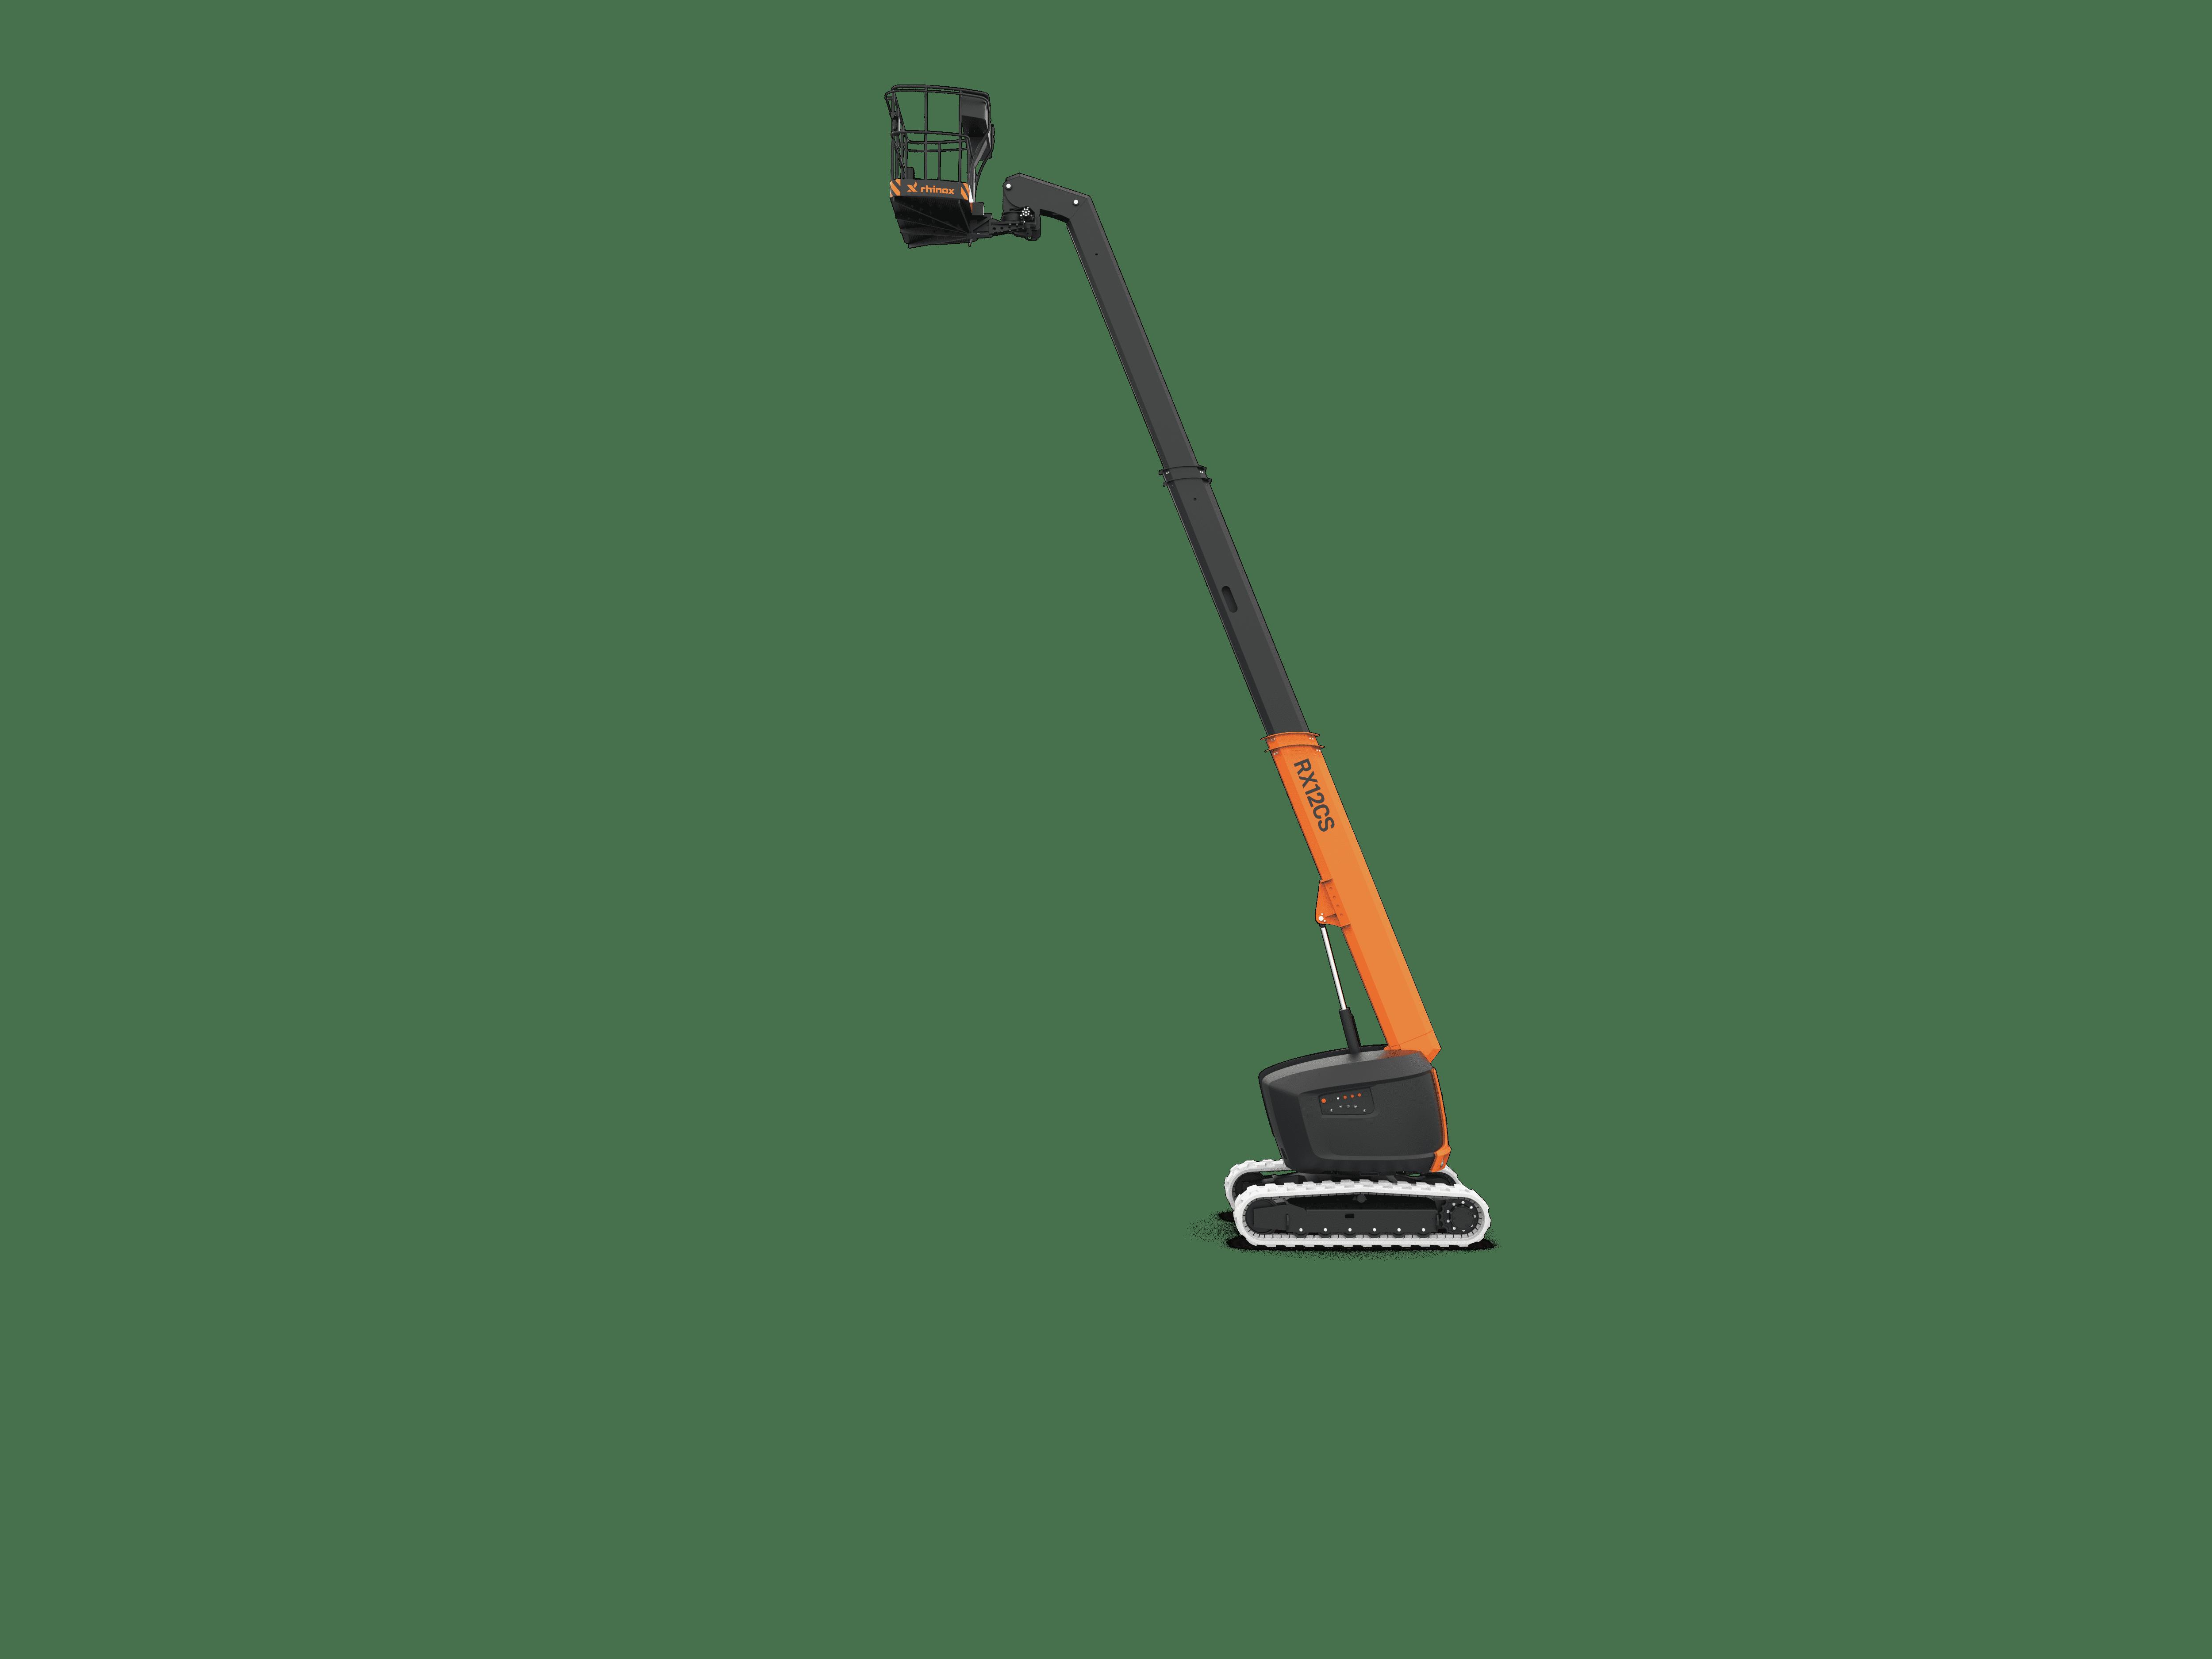 Rhinox RX12CS hoogwerker